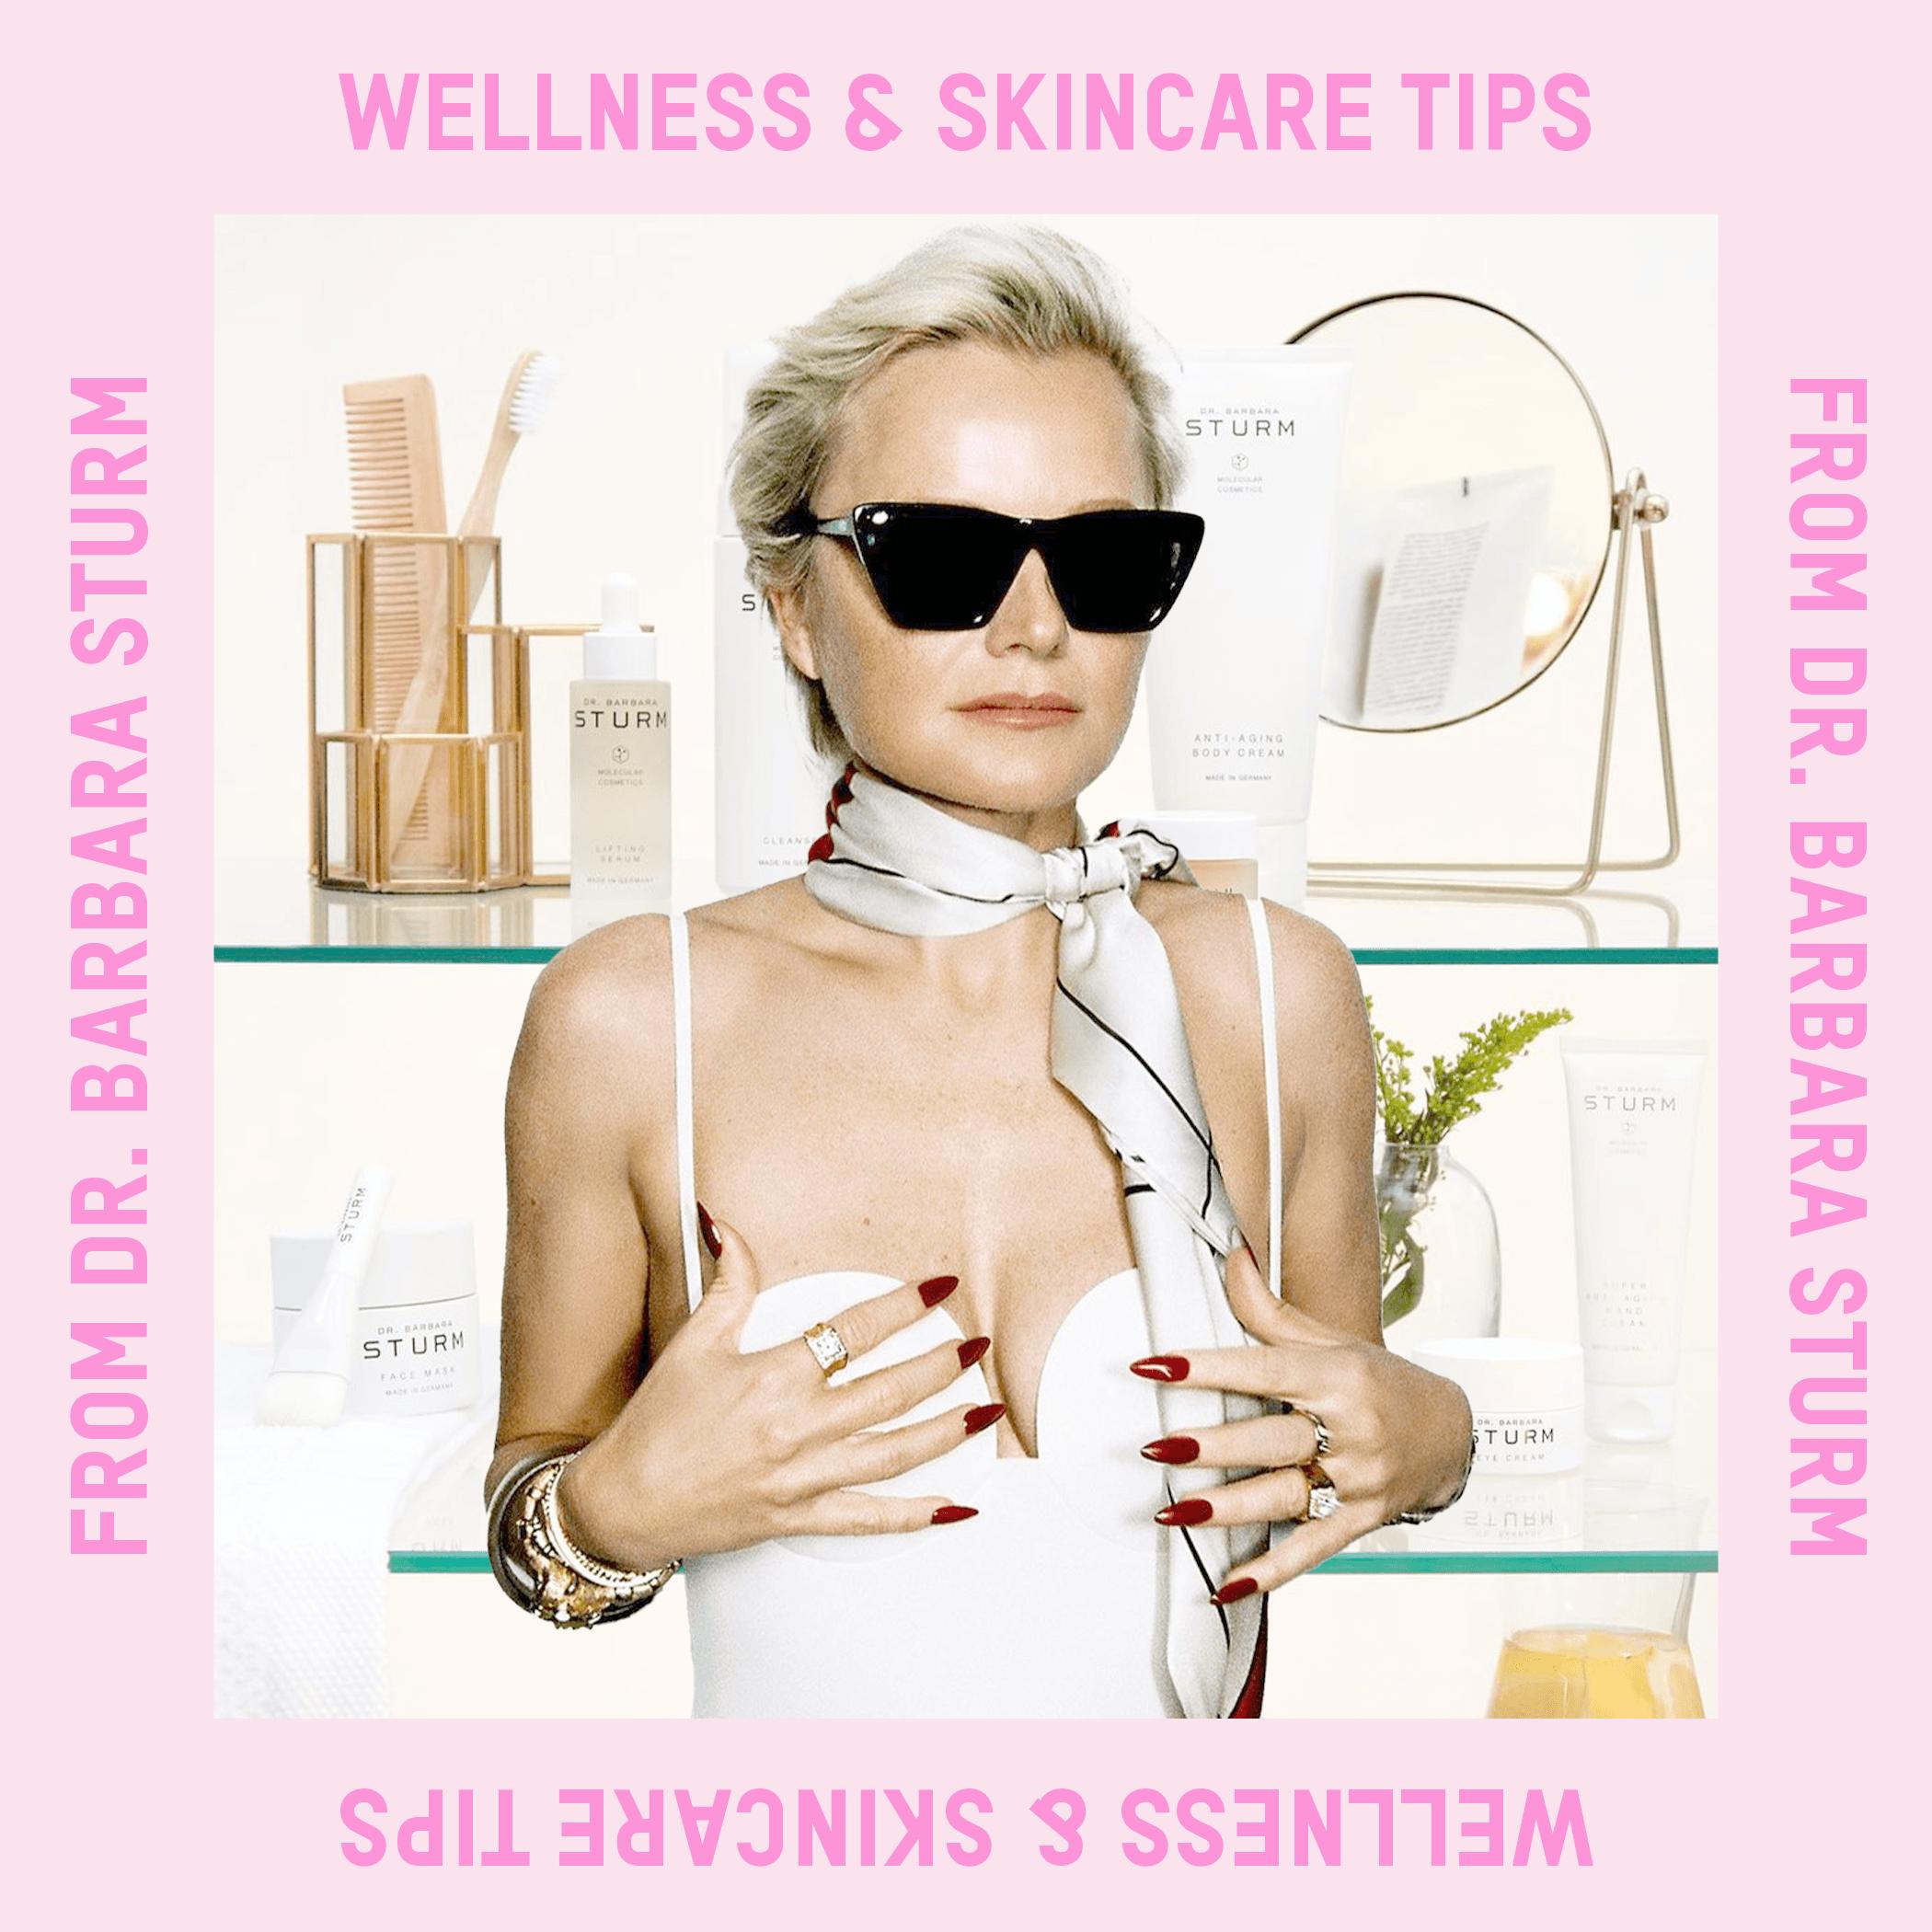 Skincare & Wellness Tips From Dr. Barbara Sturm